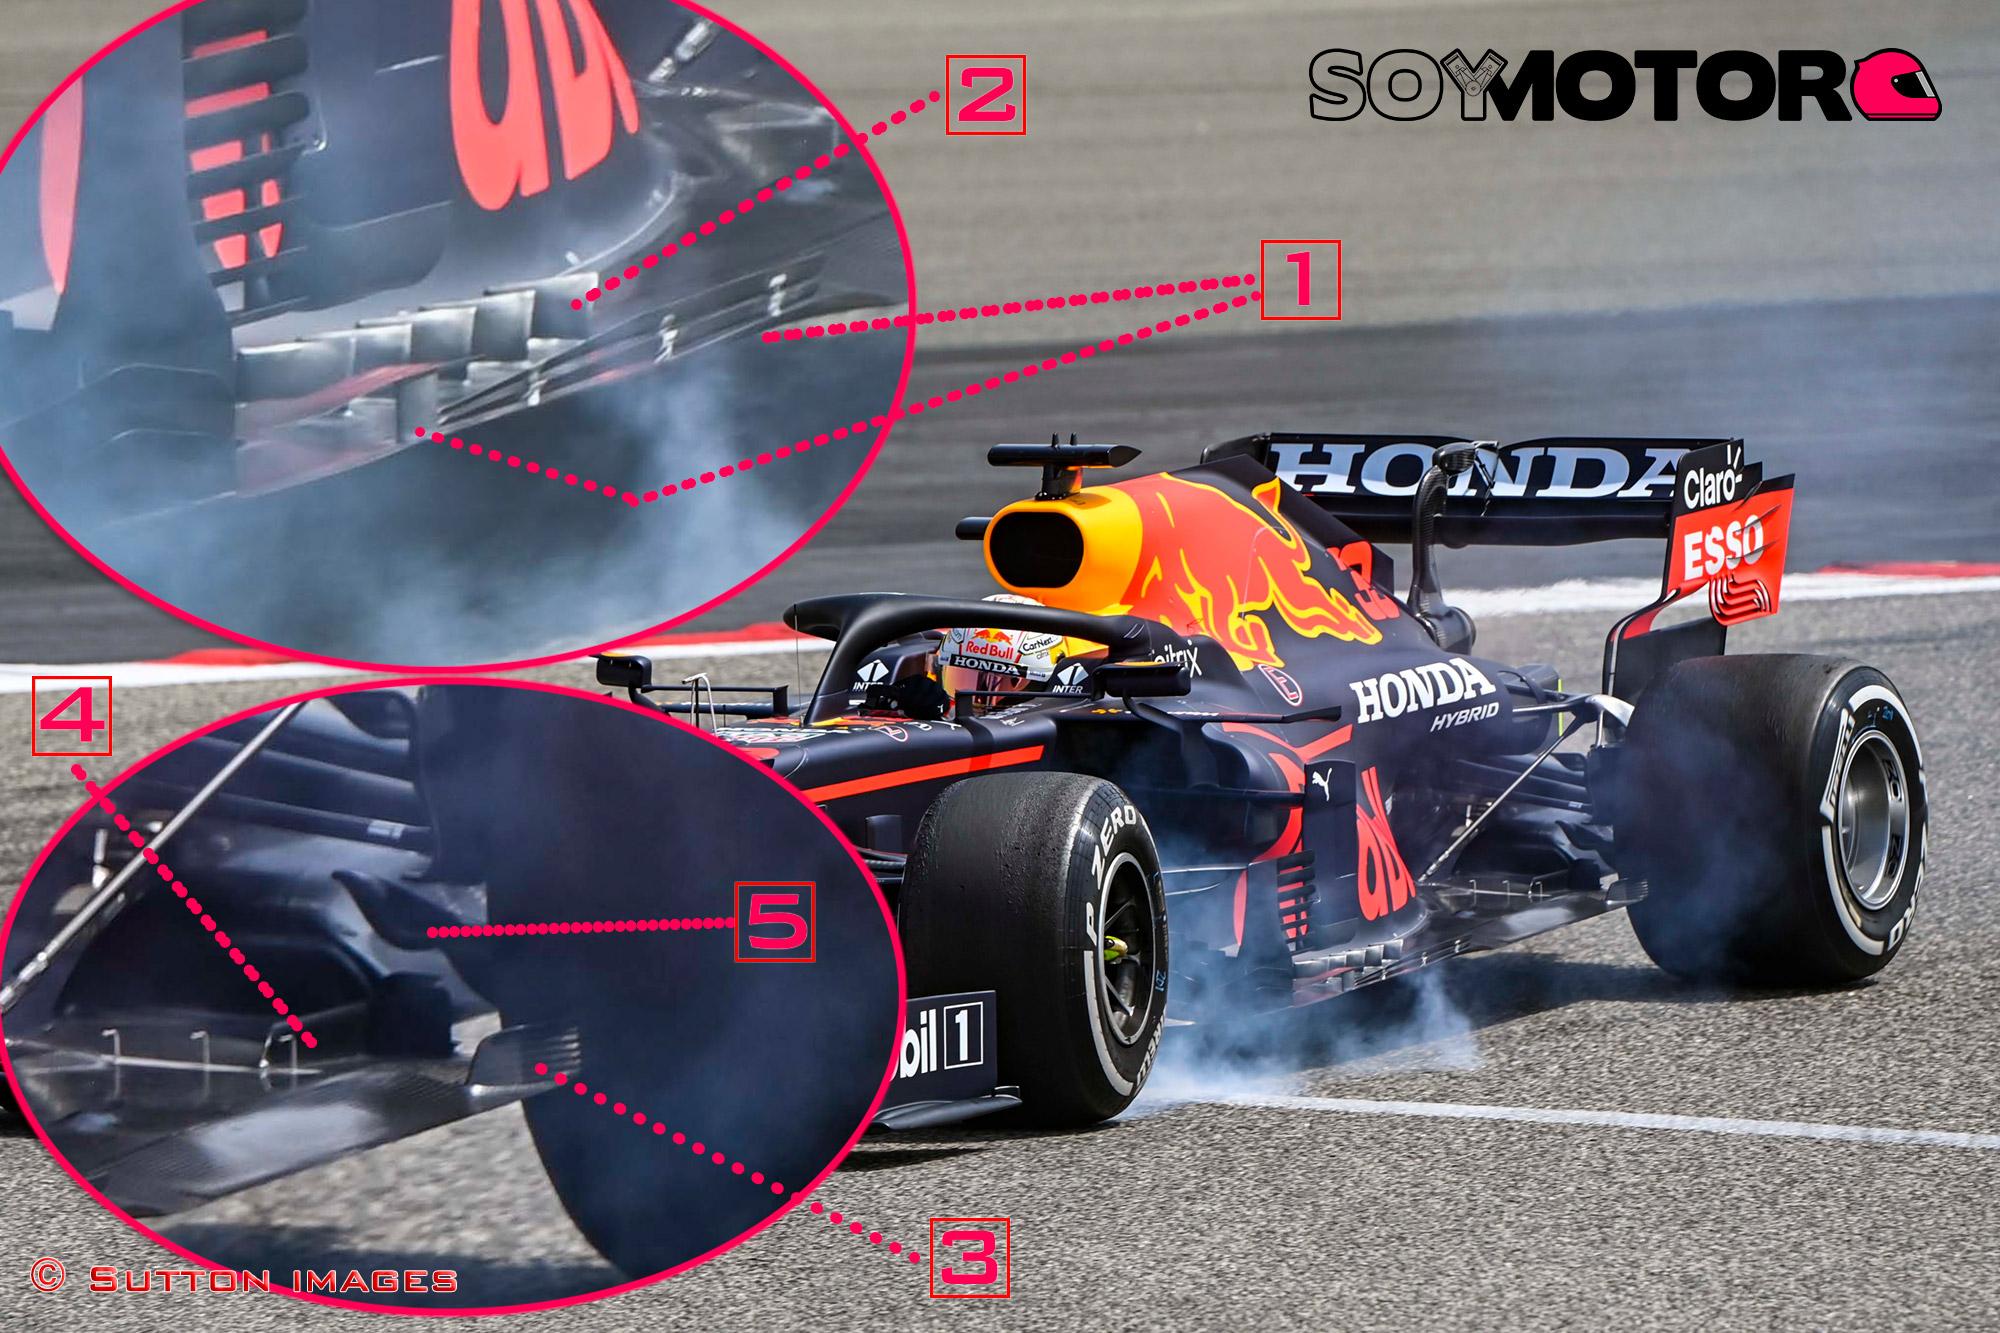 red-bull-suelo-soymotor_0.jpg